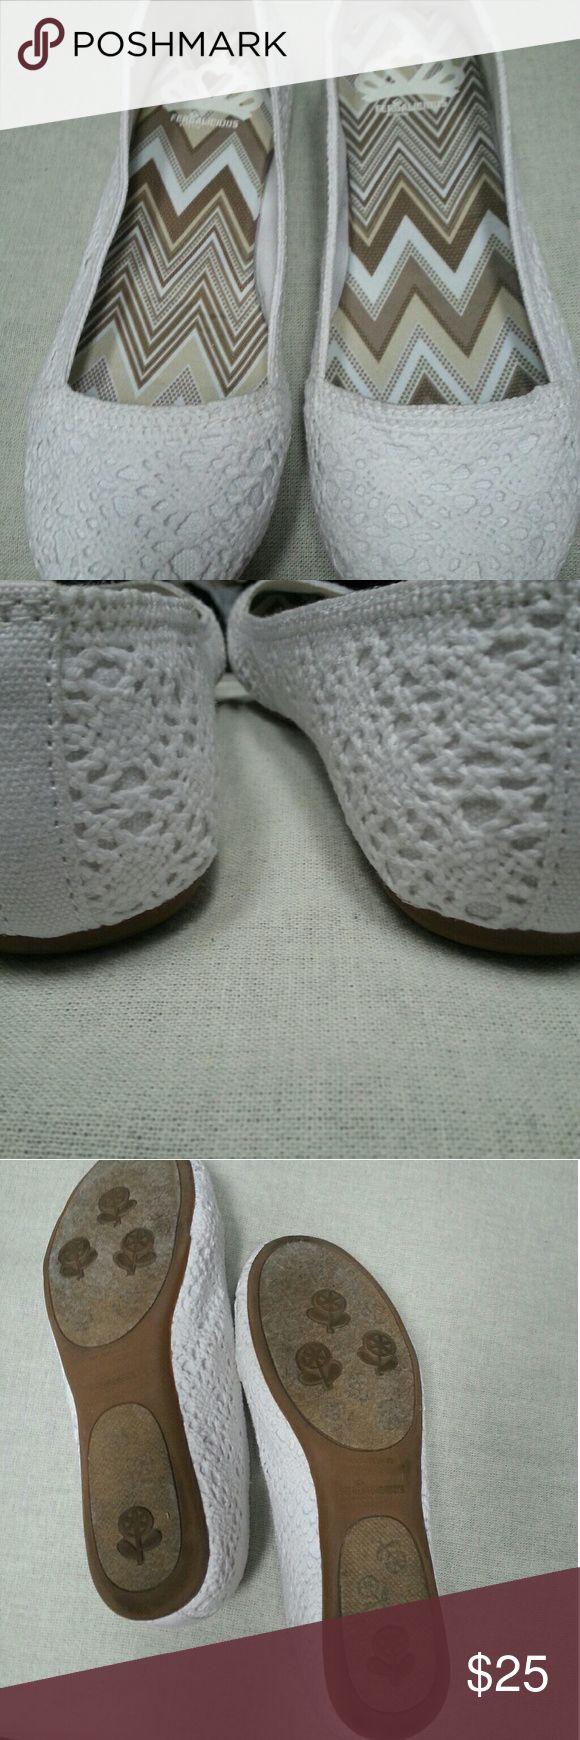 Fergalicious White slip on shoes White slip on shoes with crochet look Fergalicious Shoes